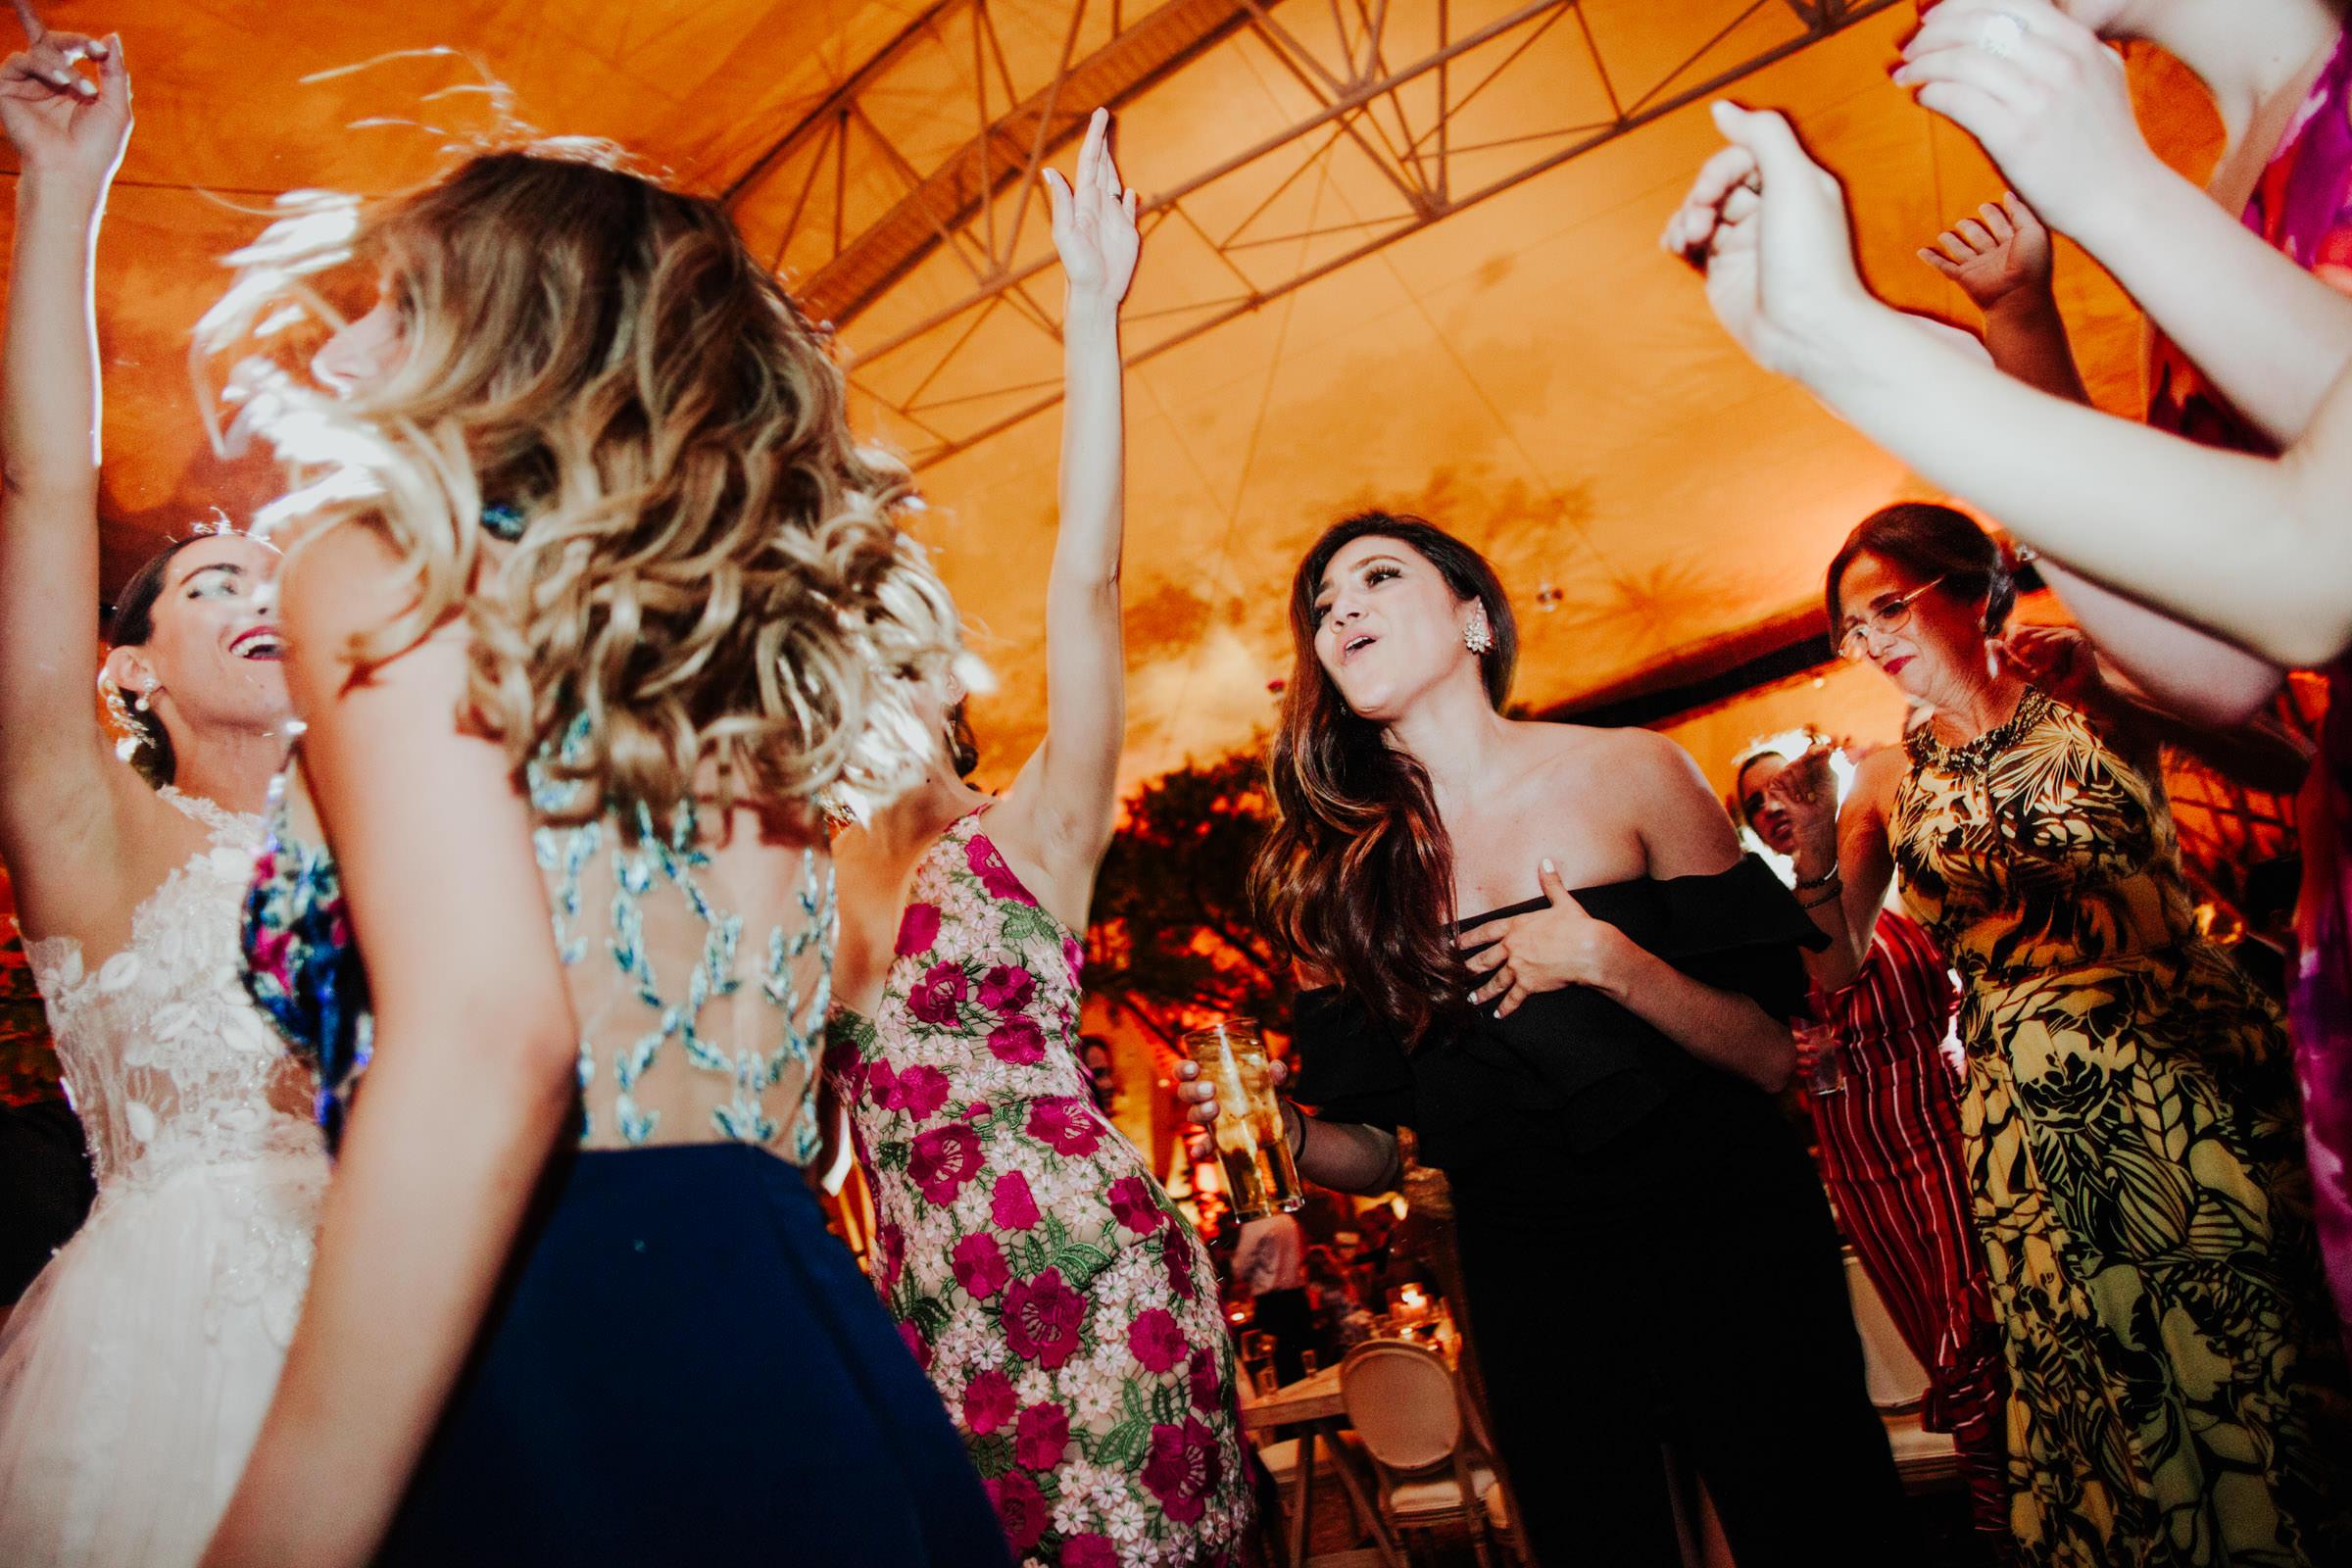 San-Miguel-de-Allende-Wedding-Photography-Parroquia-Instituto-Boda-Fotografia-Fer-Sergio-Pierce-Lifestyle-Photography0065.JPG